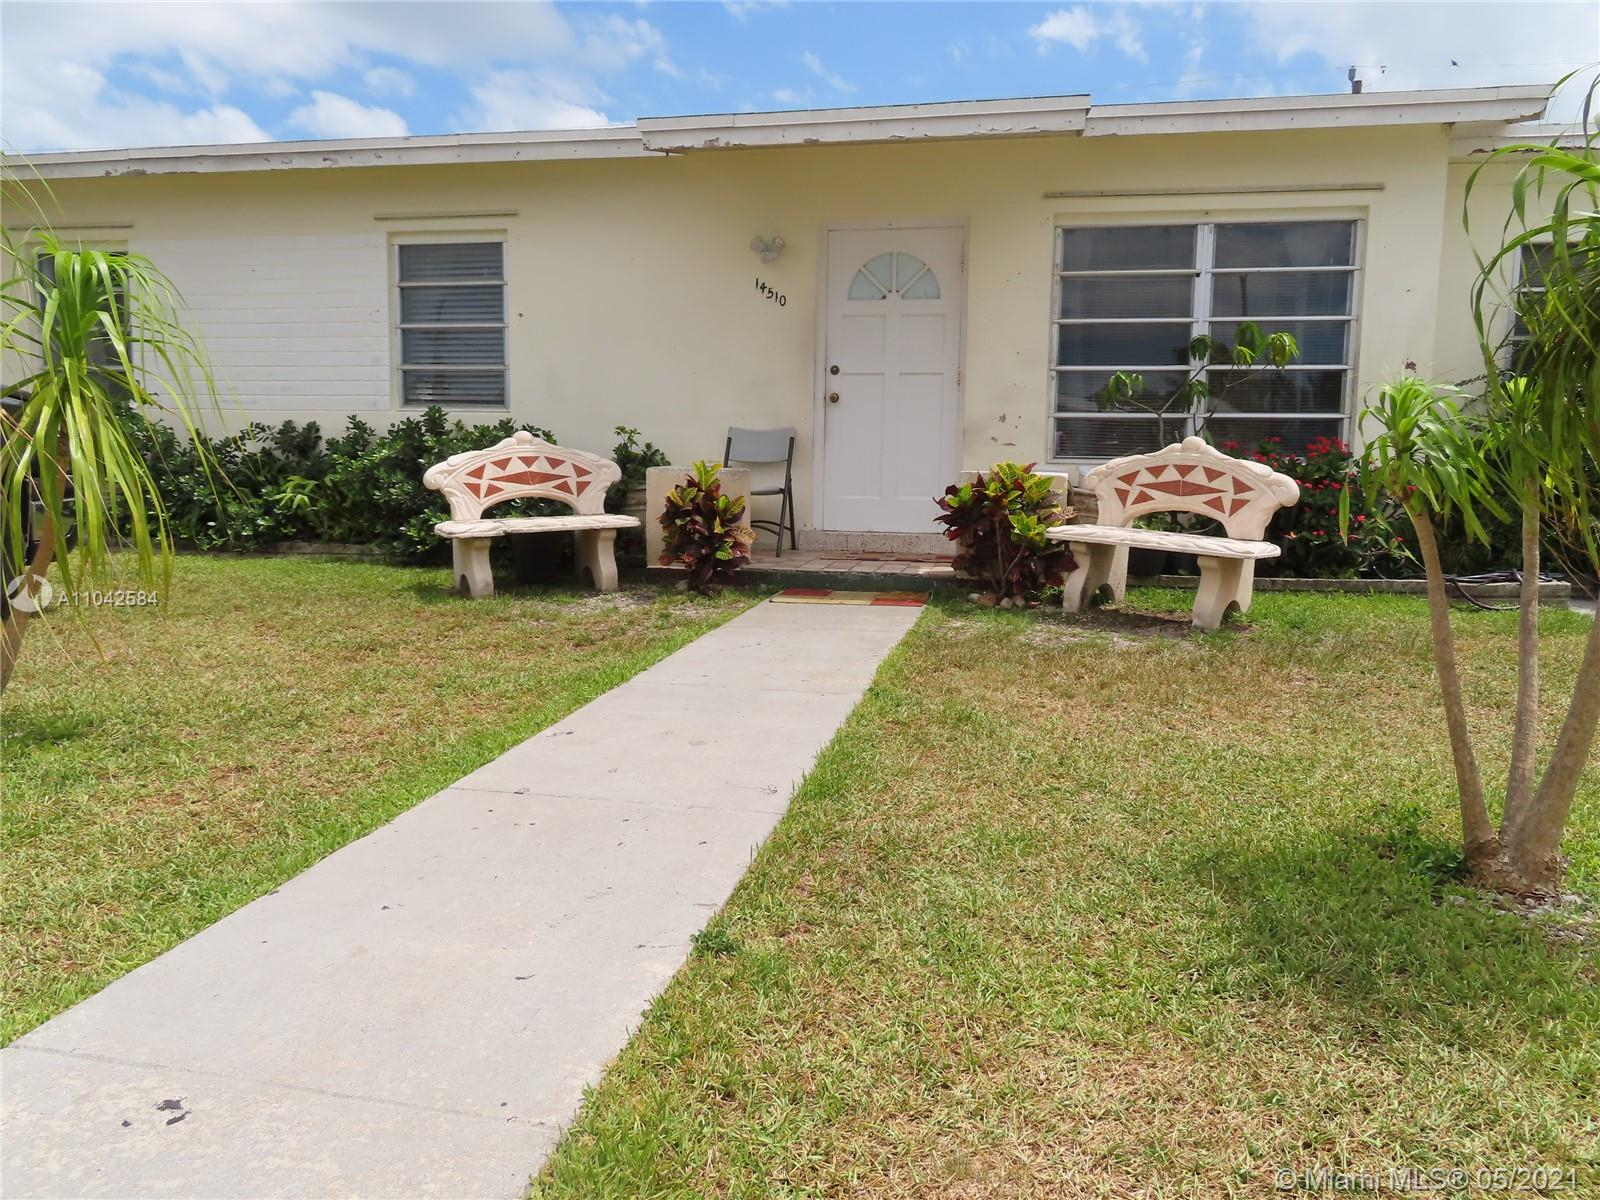 14510 Sw 291st St Property Photo